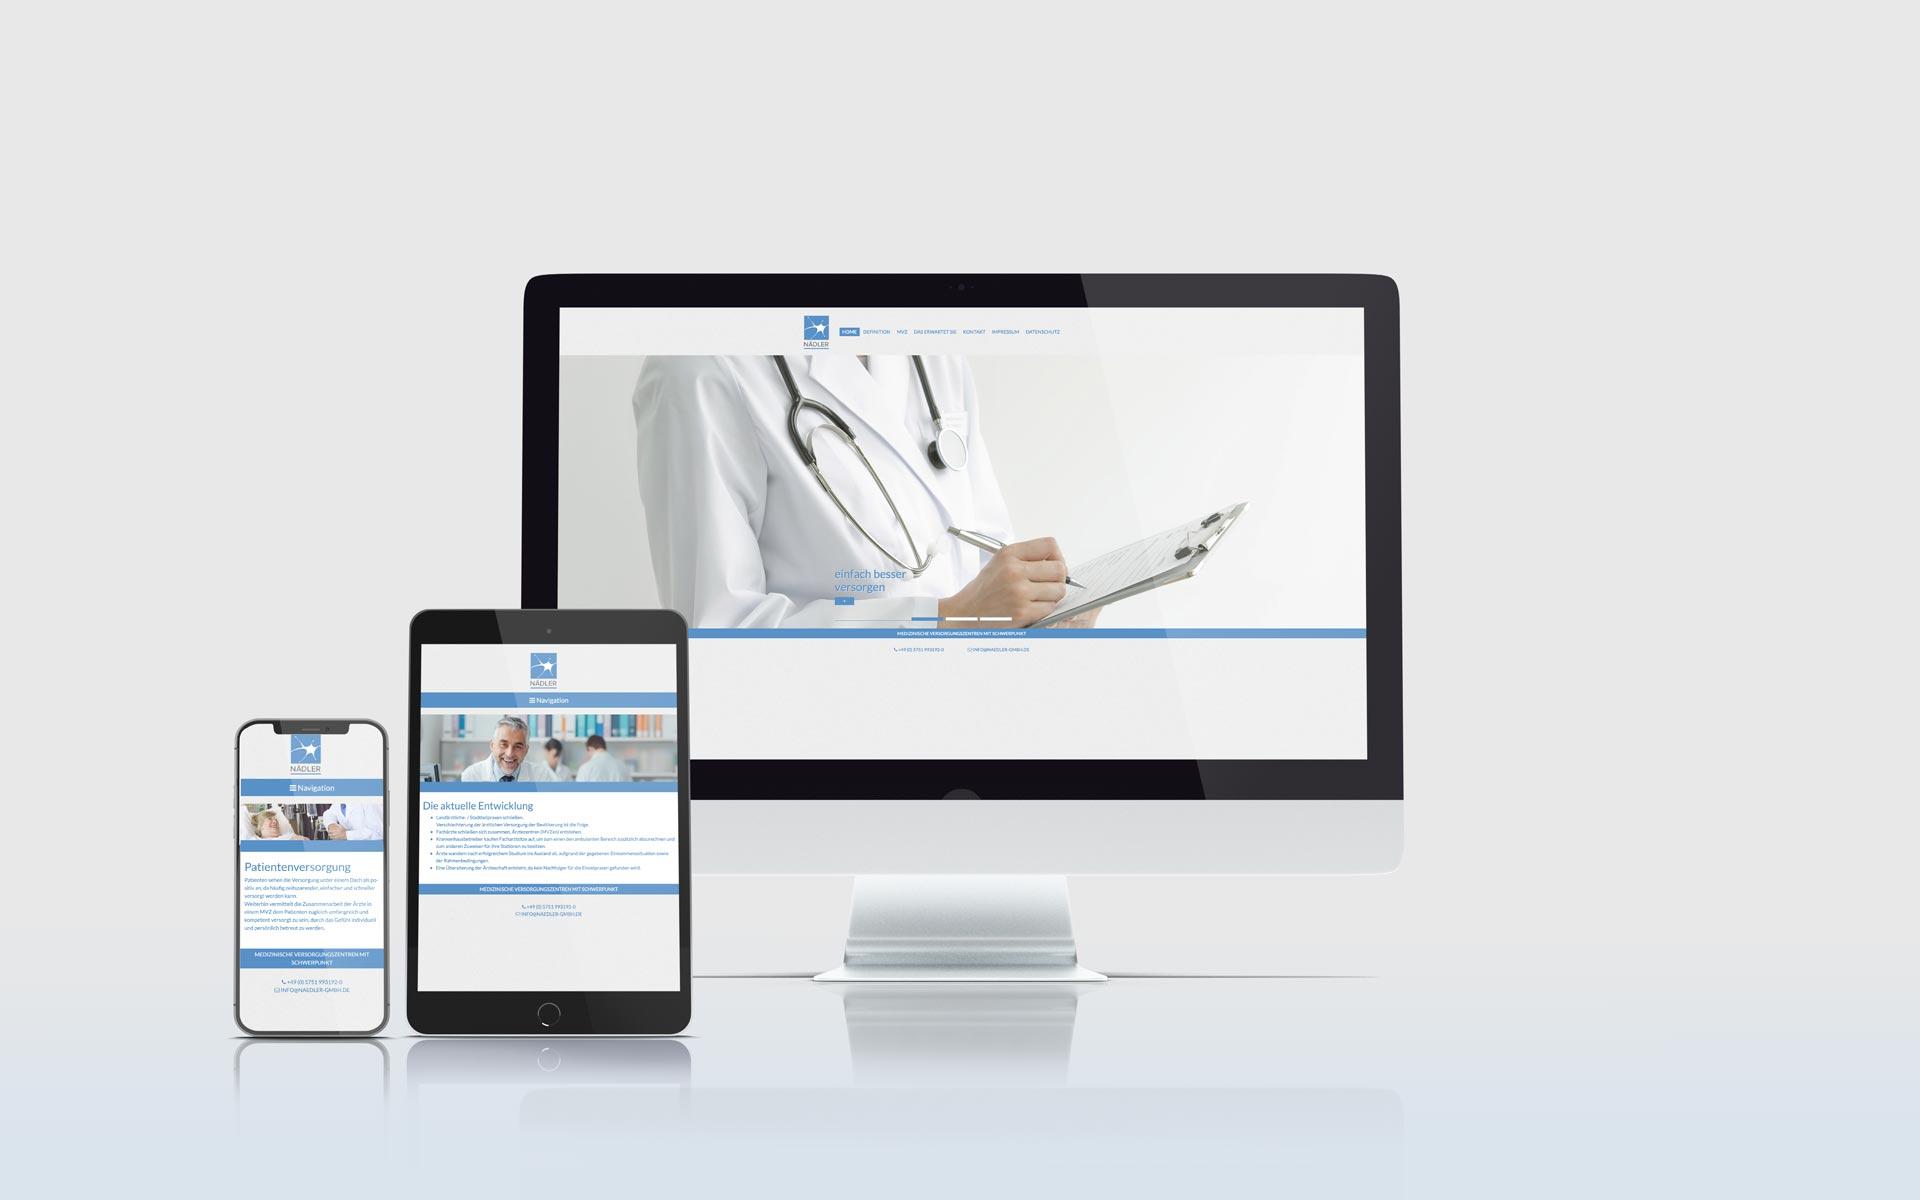 Mockup der Website der Firma Nädler GmbH